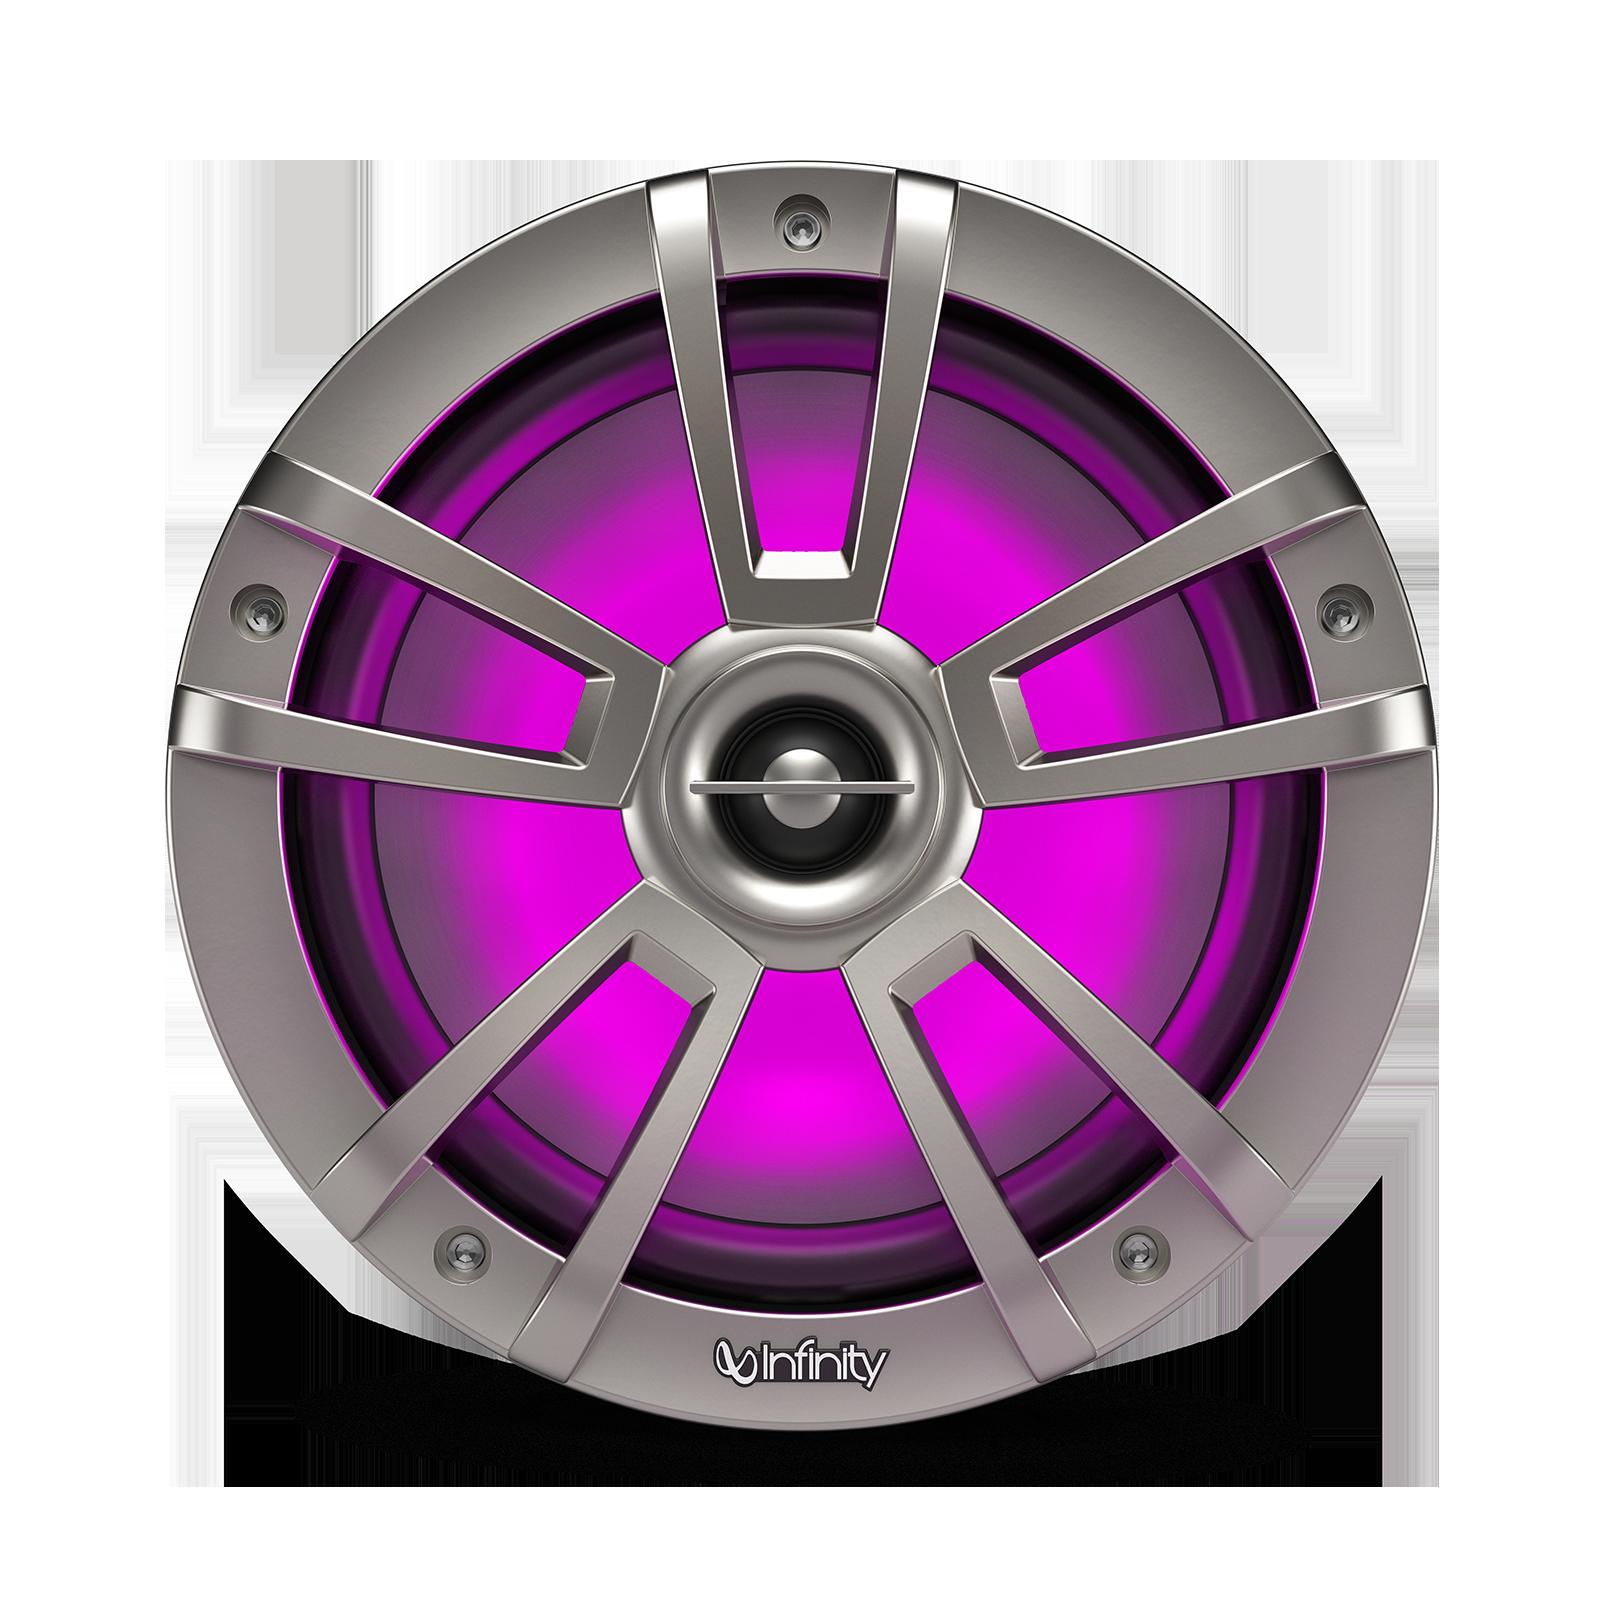 "Reference 822MLT - Graphite - Reference 822MLT—8"" (200mm) two-way marine audio multi-element speaker – titanium - Detailshot 2"